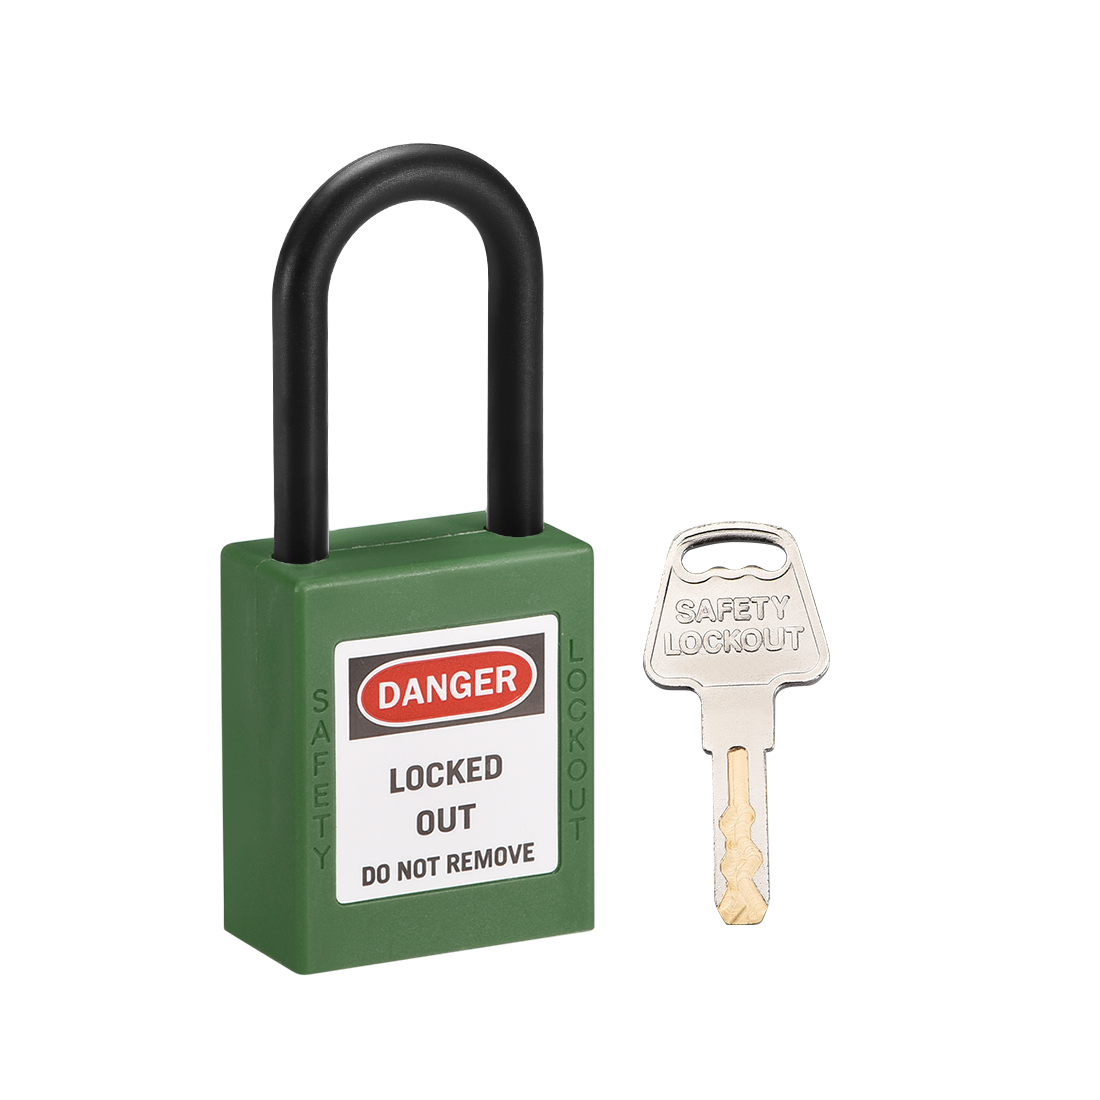 Lockout Tagout Locks, 1-1/2 Inch Shackle Key Alike Safety Padlock Plastic, Green